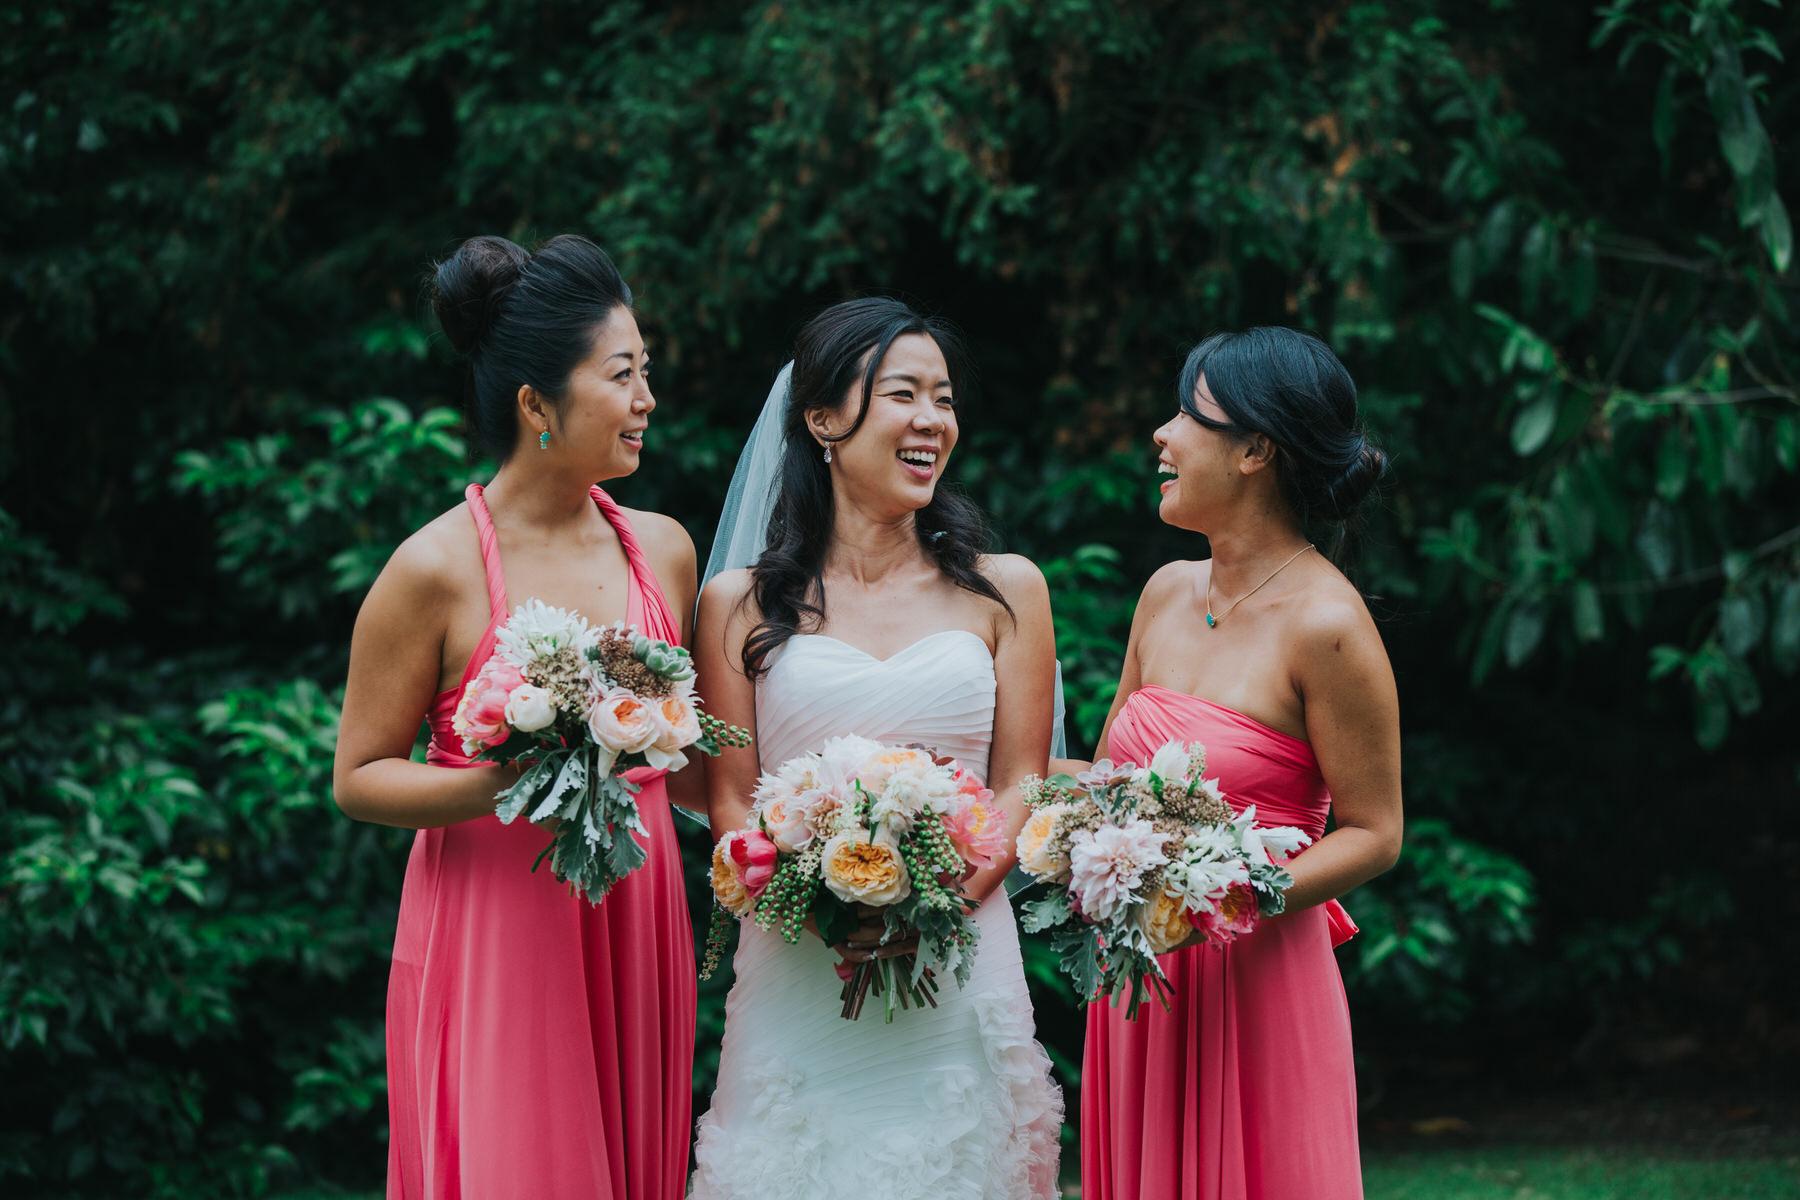 366 bridesmaids in pink bride fun photo.jpg